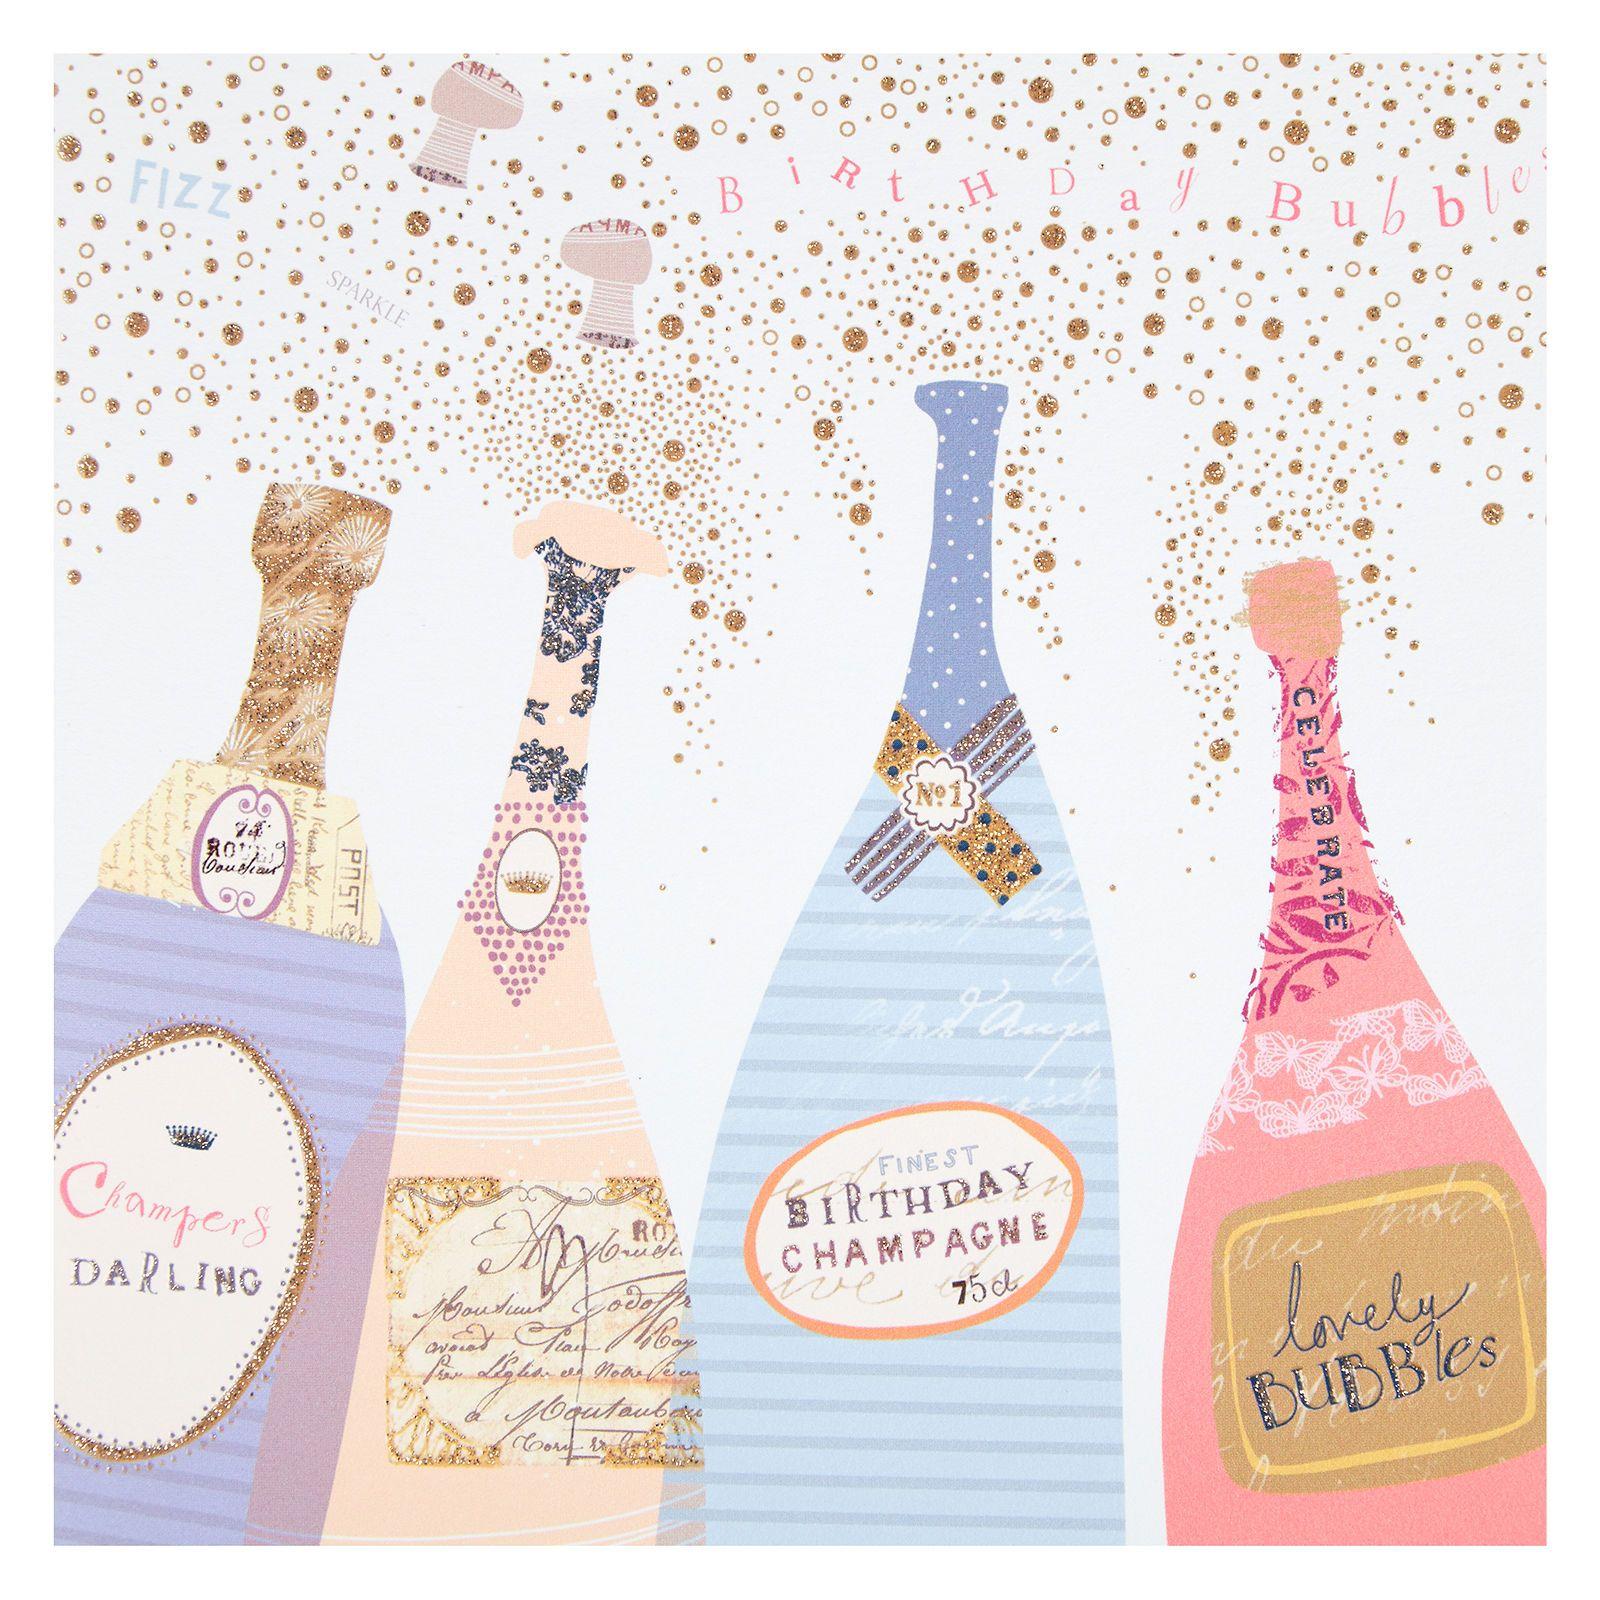 Woodmansterne Champagne Bottles Birthday Card Birthday